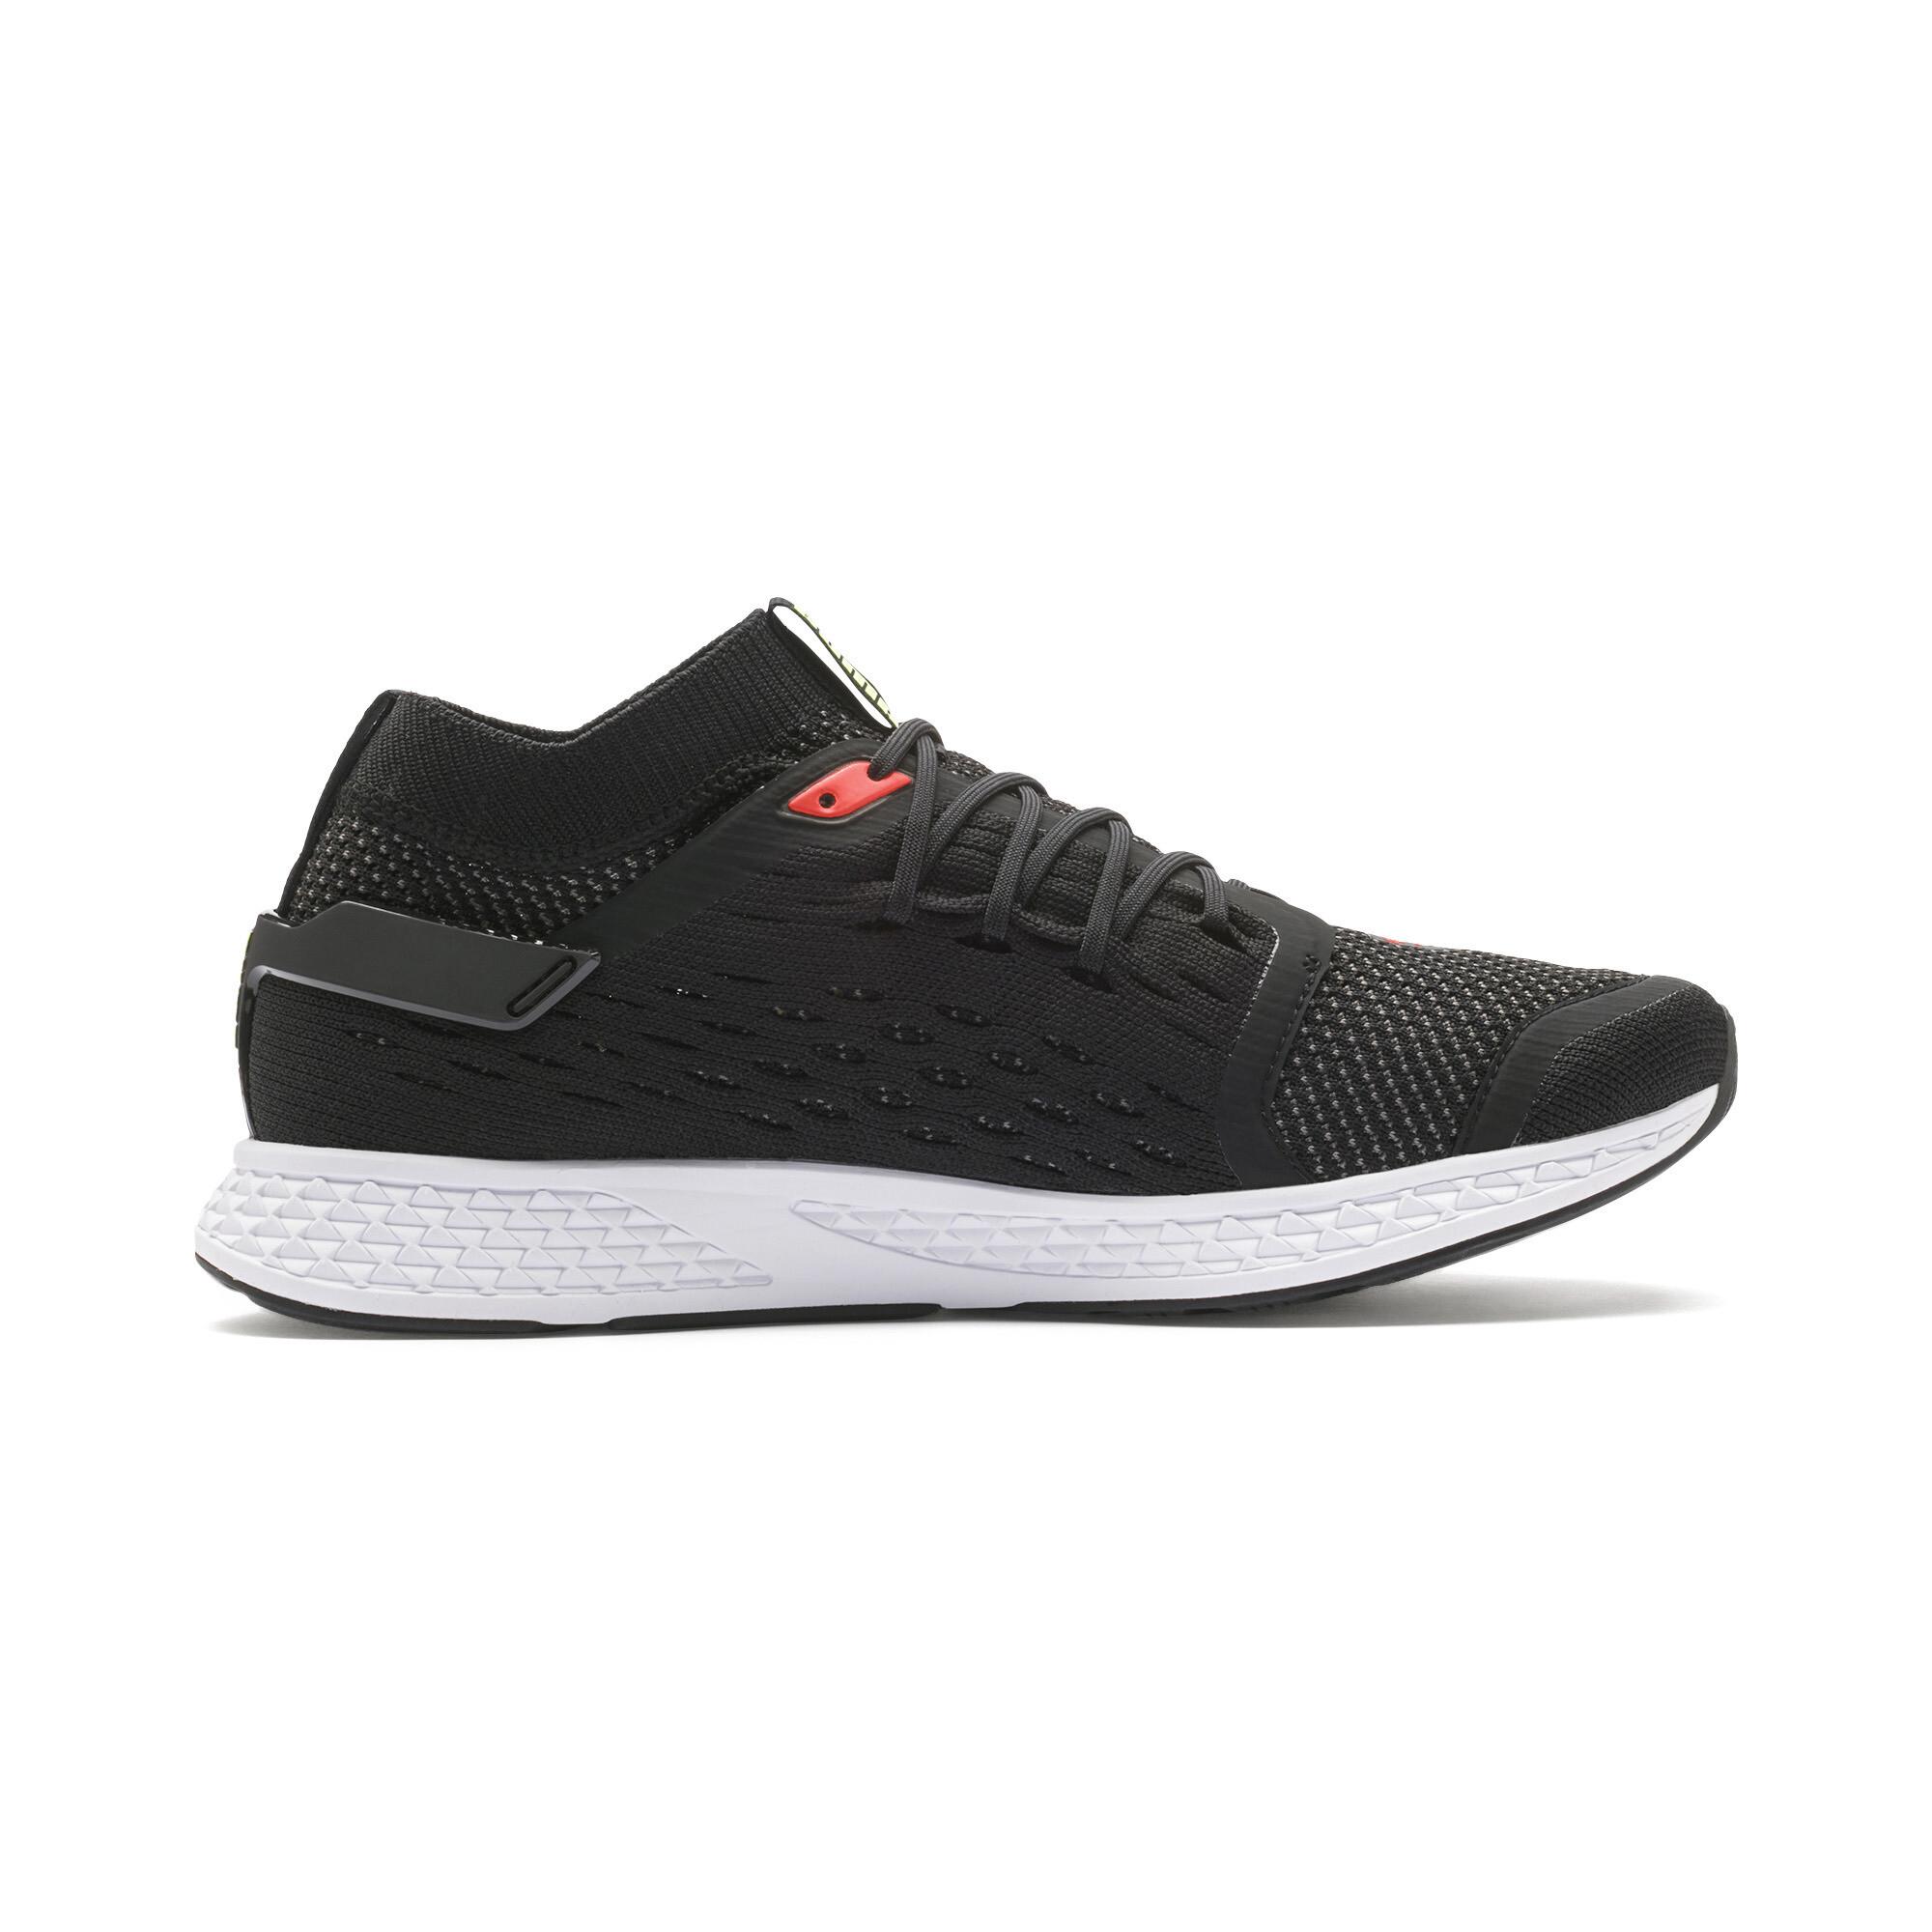 PUMA-SPEED-500-Men-039-s-Running-Shoes-Men-Shoe-Running thumbnail 7